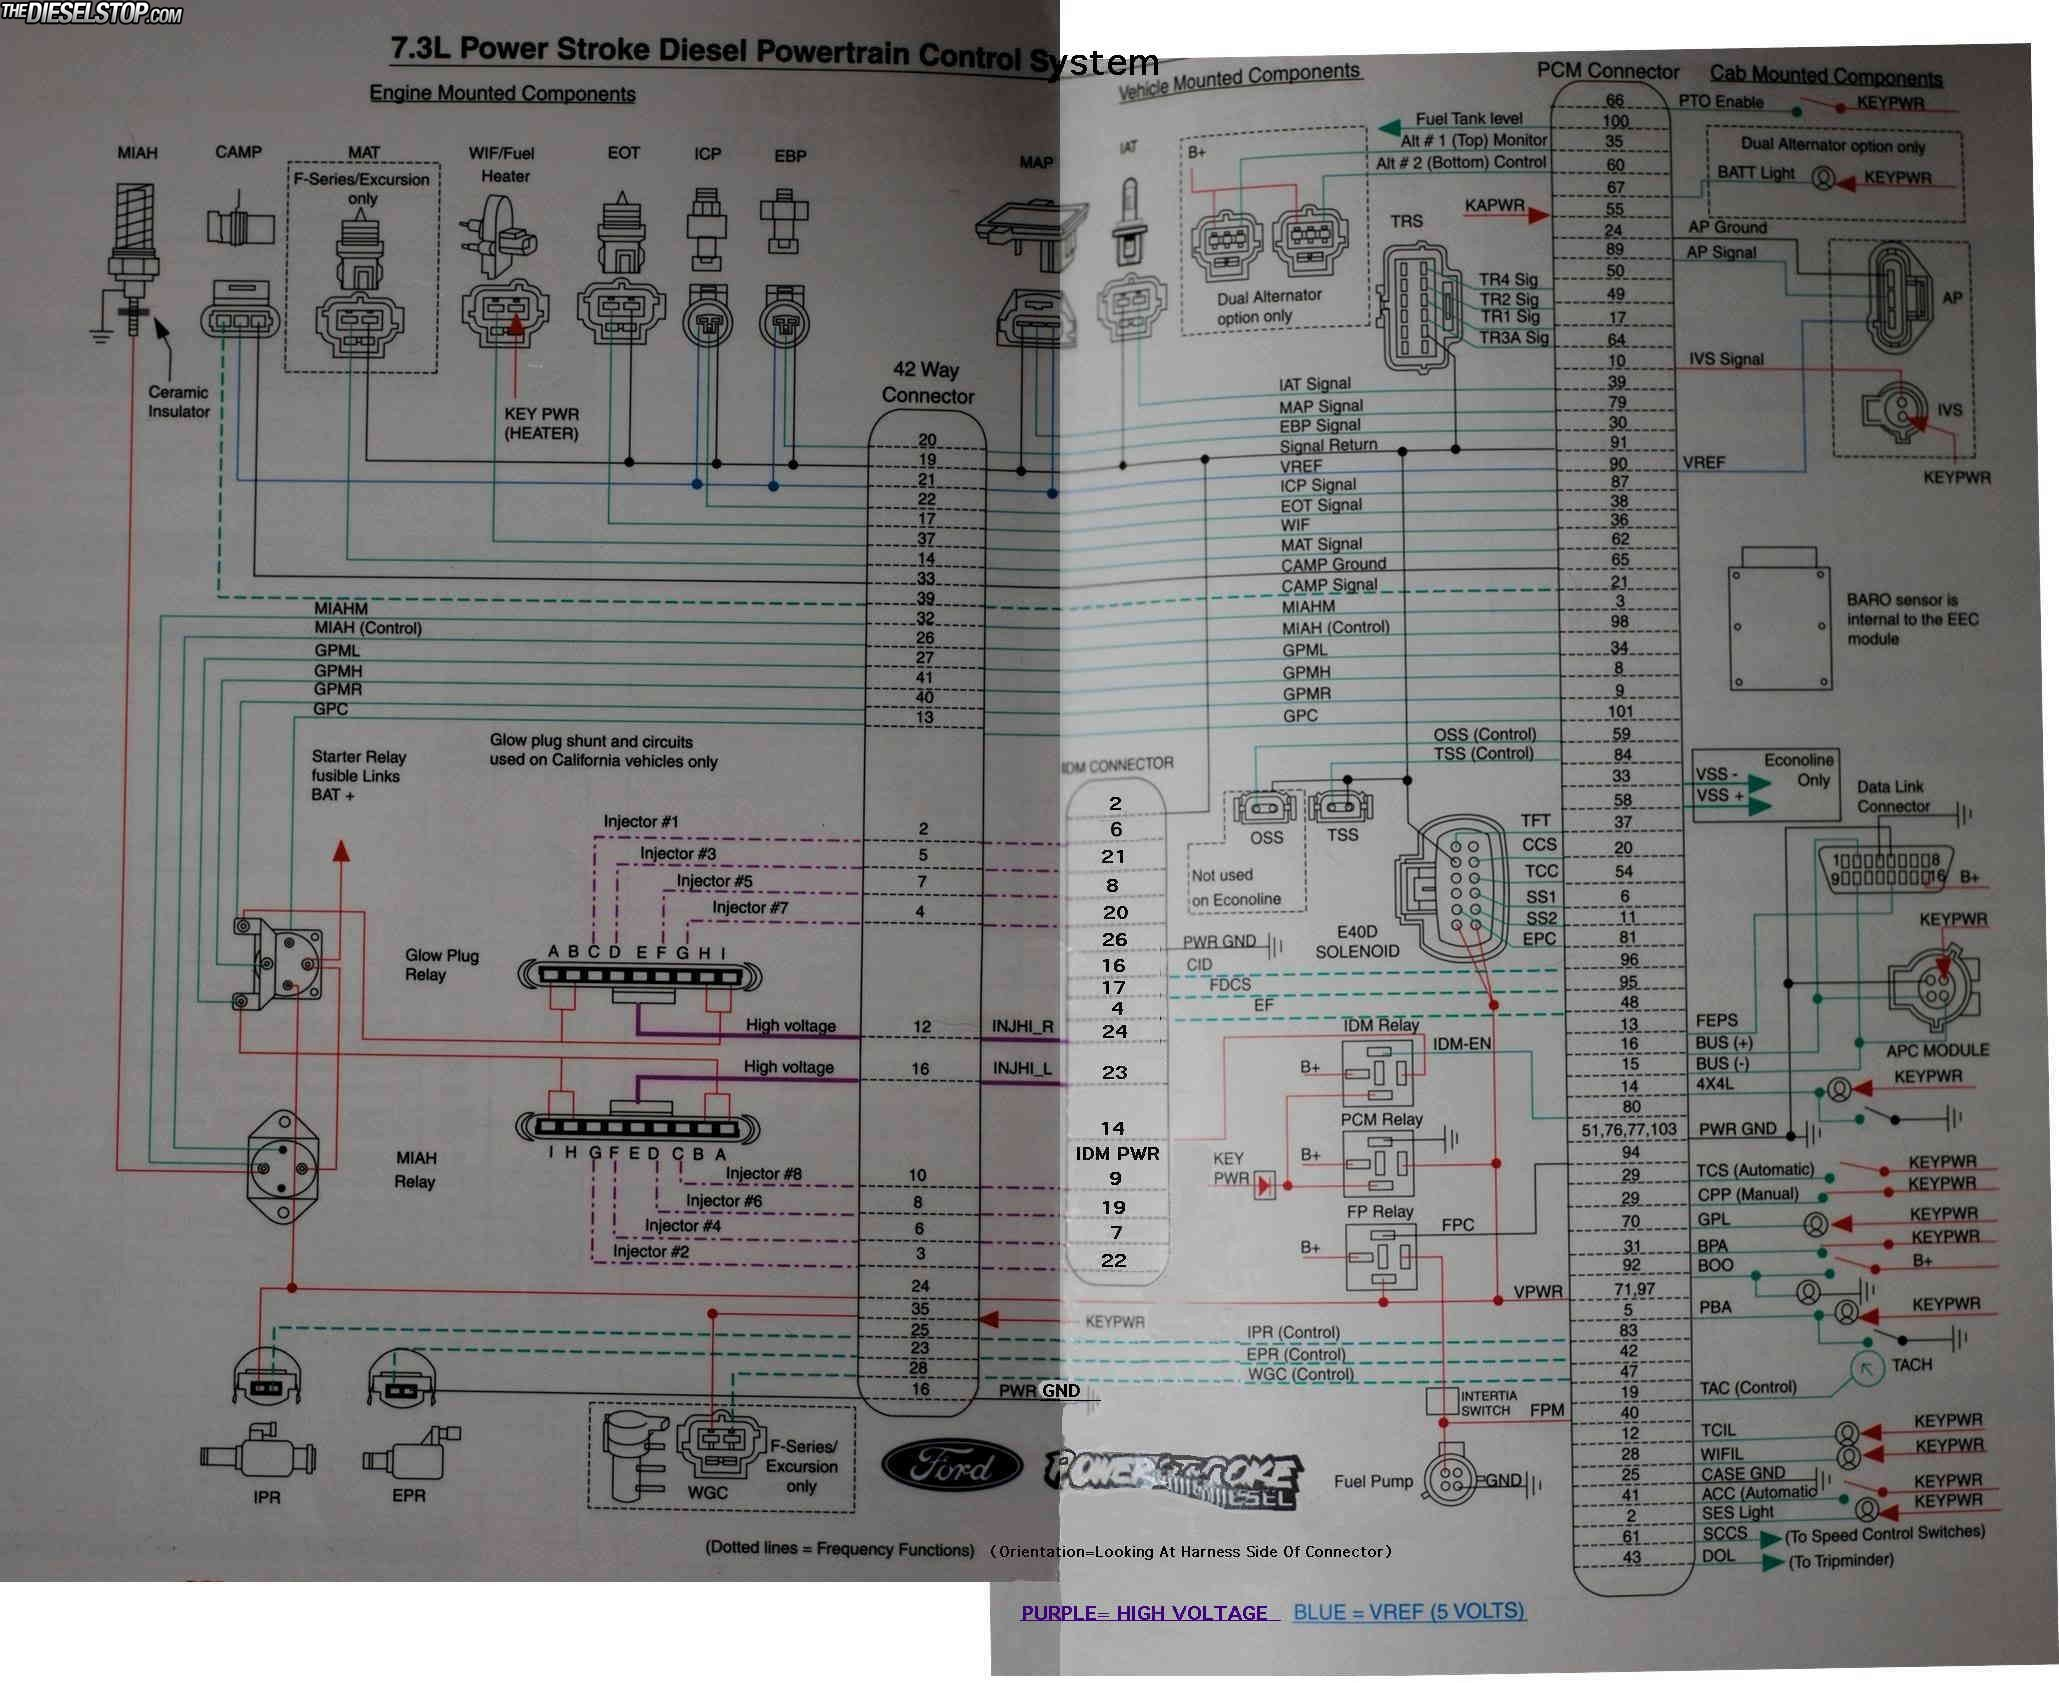 7 3 Powerstroke Engine Diagram Diesel Engine Layout Diagram Inspirational Flashing Od Light Diesel Of 7 3 Powerstroke Engine Diagram